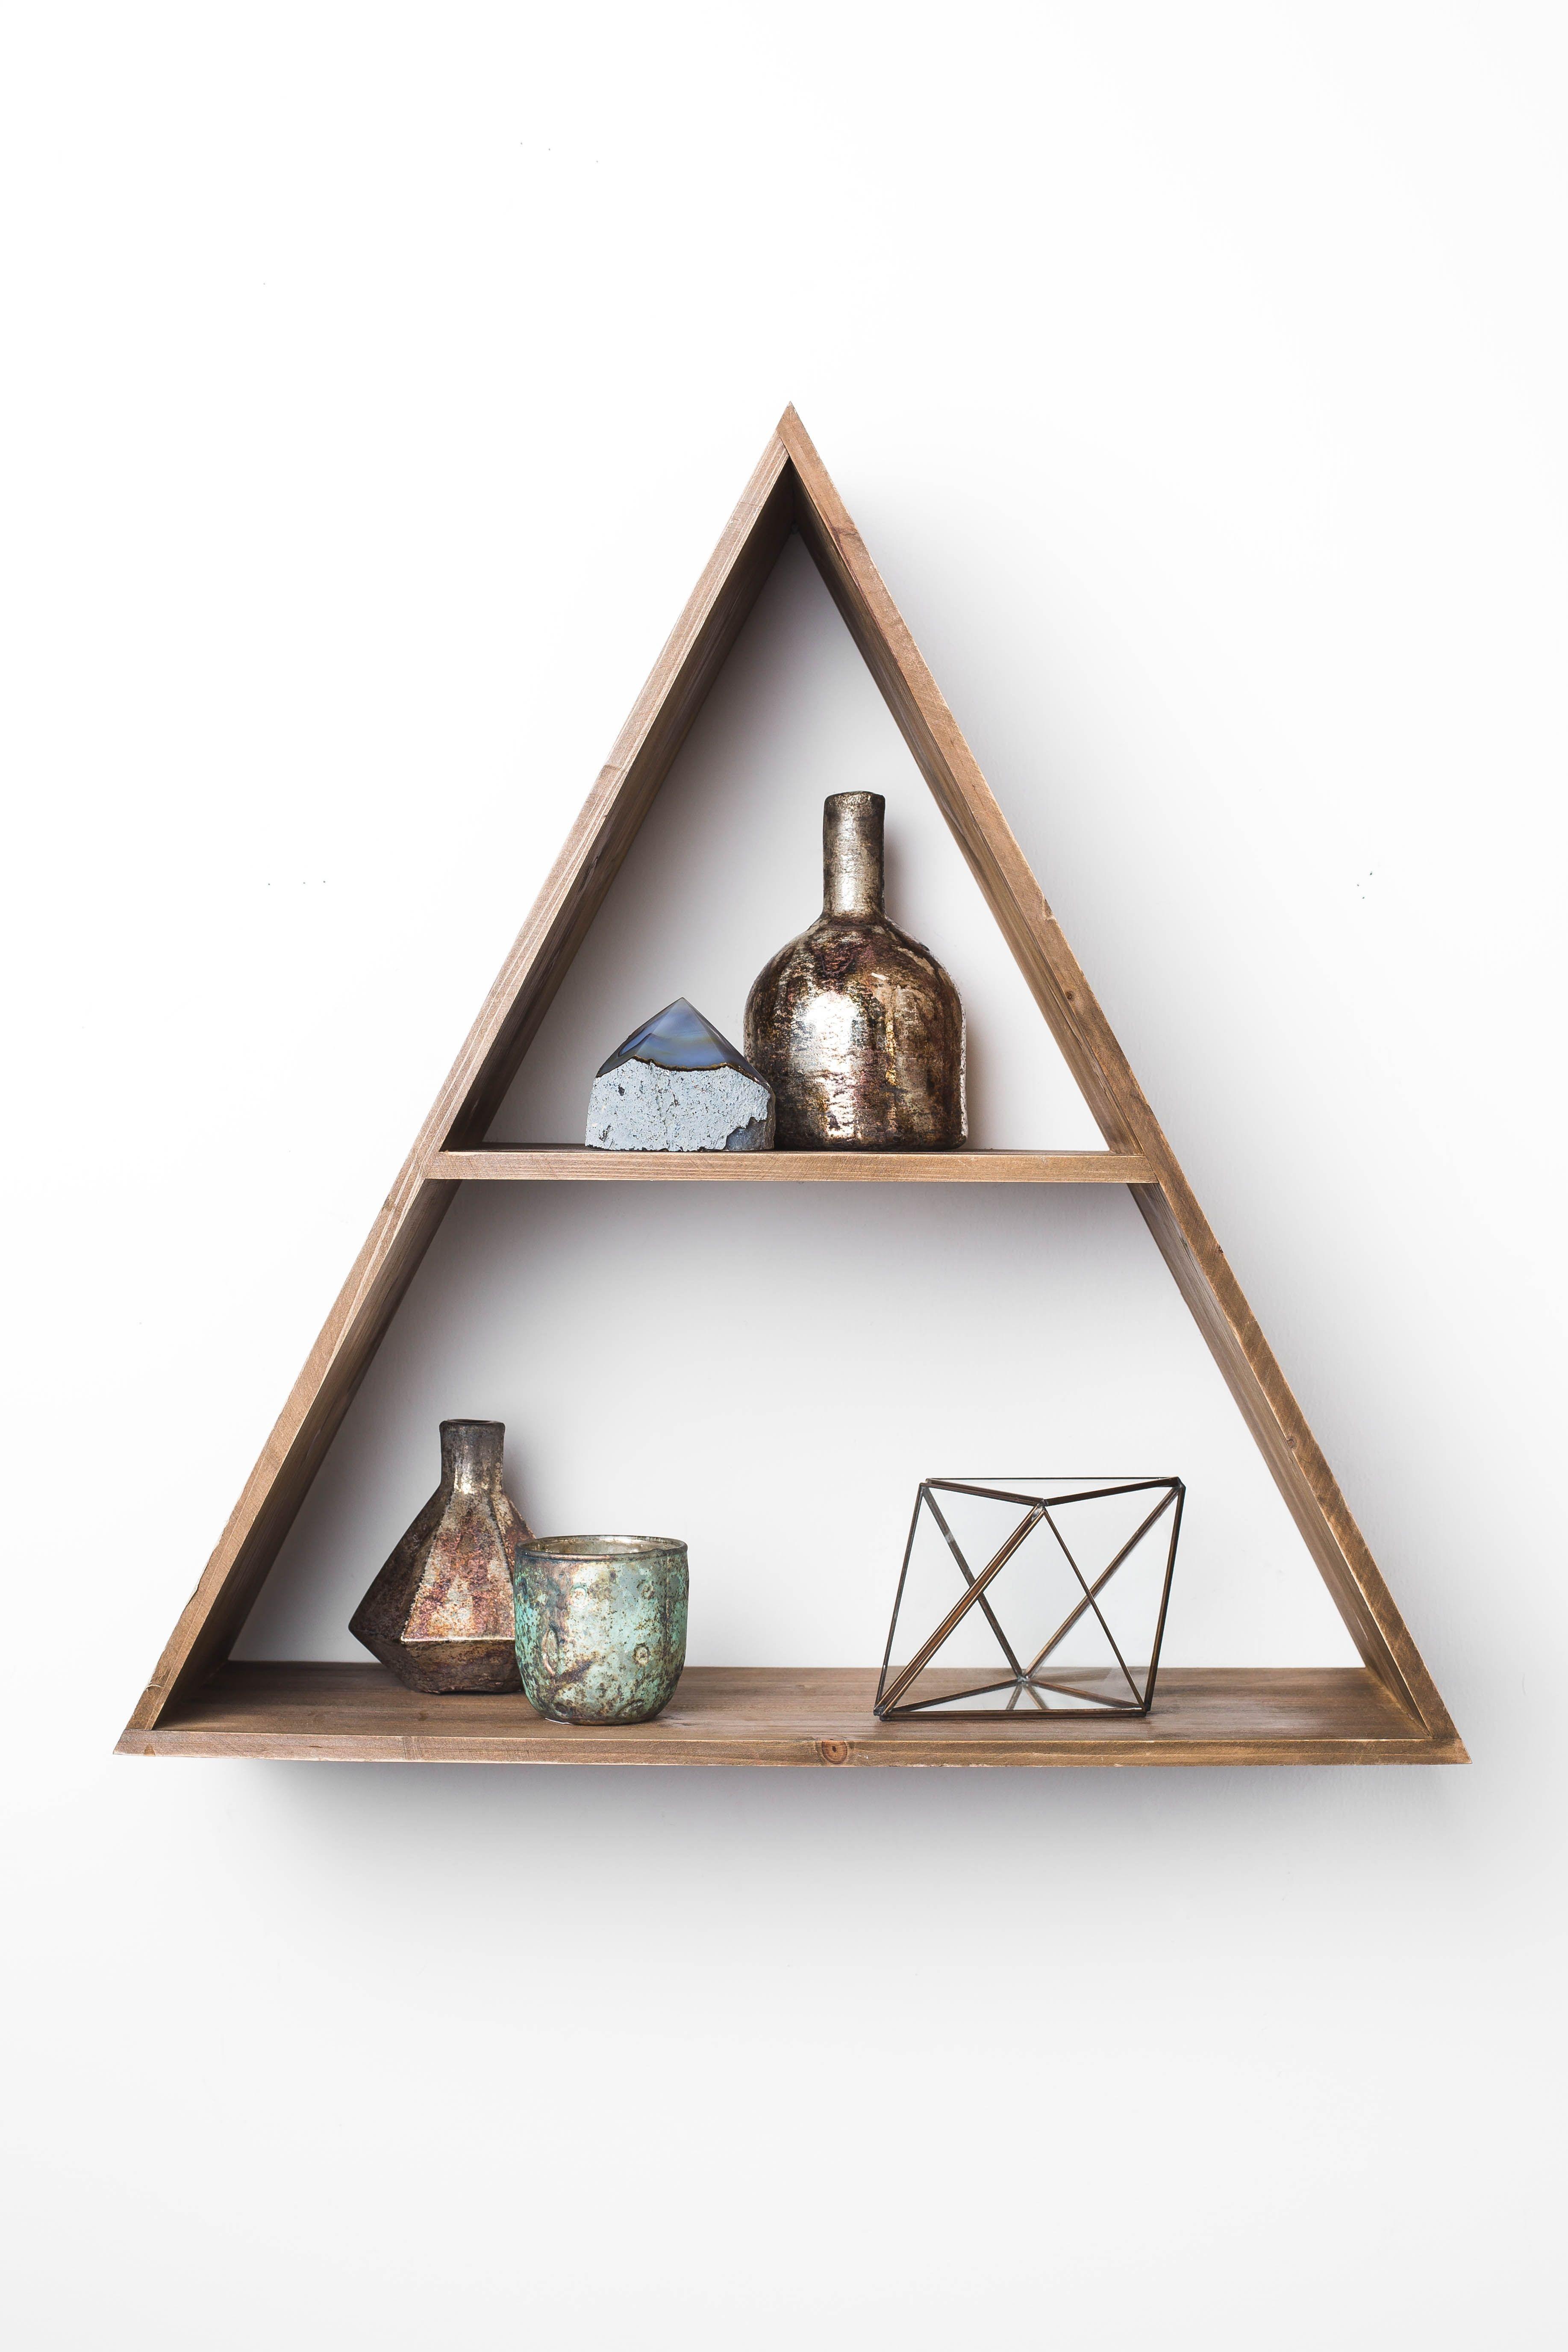 Triangle Wood Shelf 49 95 Triangle Wood Shelf Wood Shelves Decor